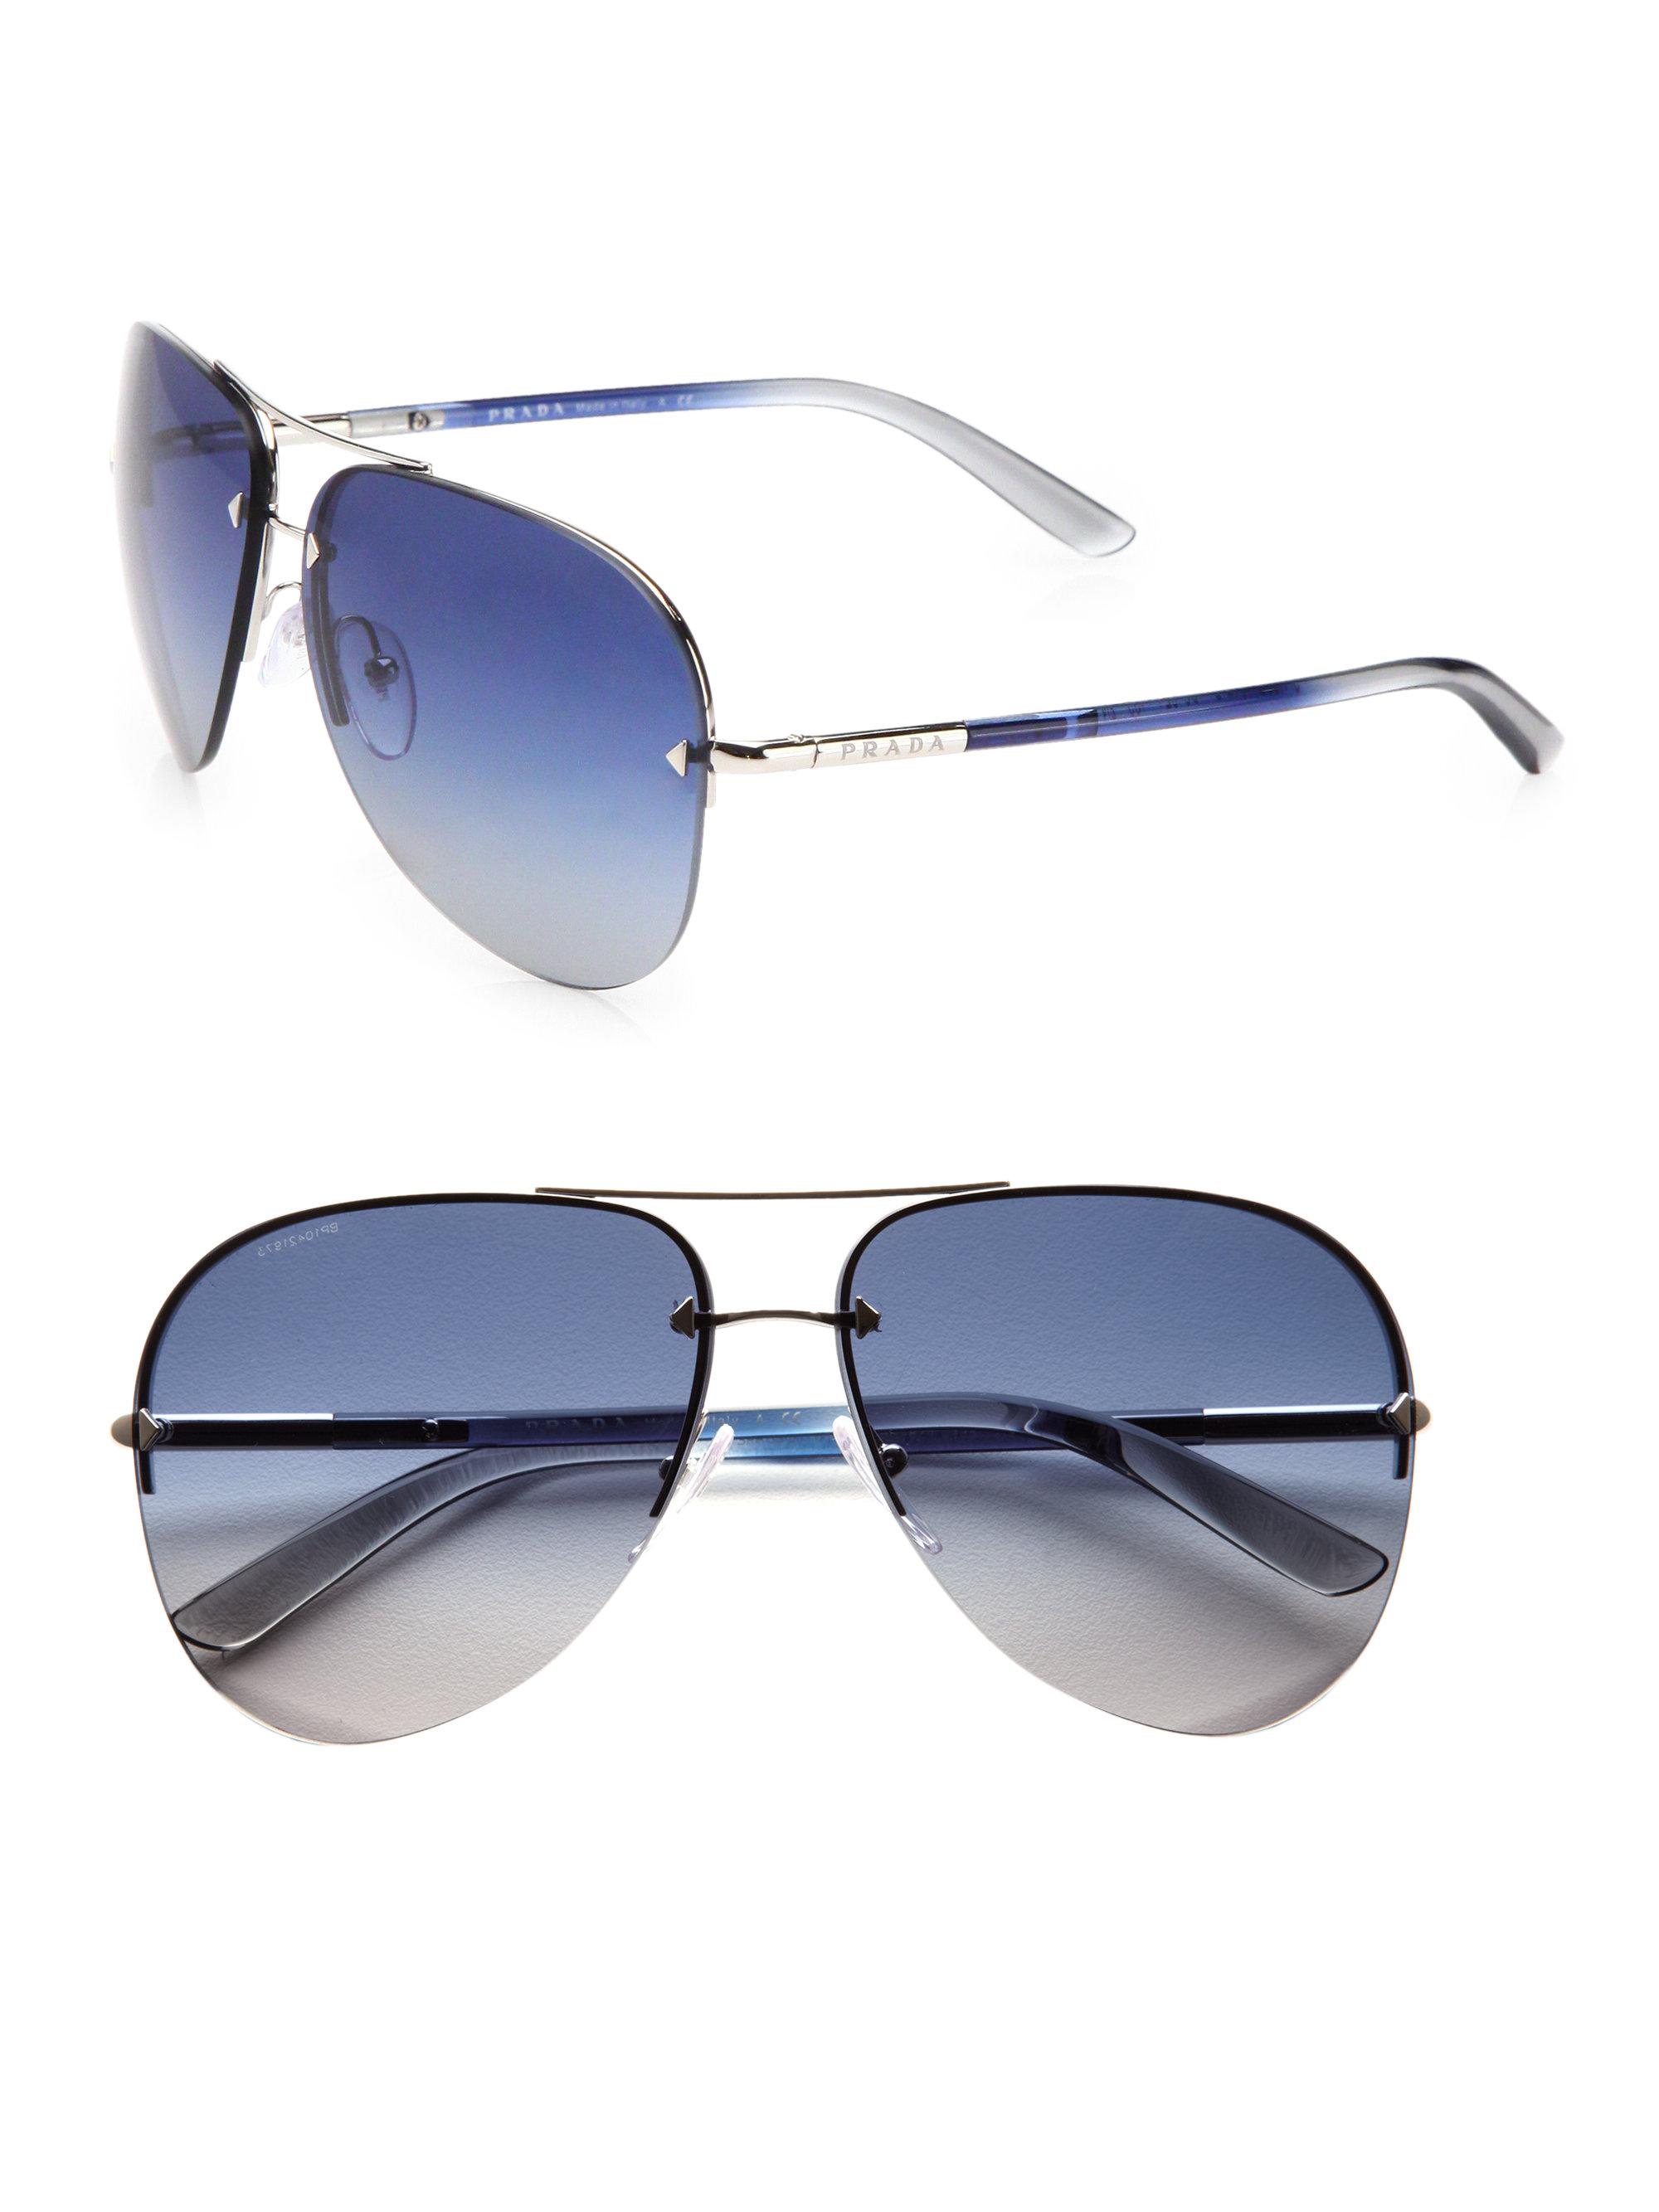 9a0f36be4a78 ... inexpensive lyst prada tubular aviator sunglasses in metallic for men  c6cd0 2895a